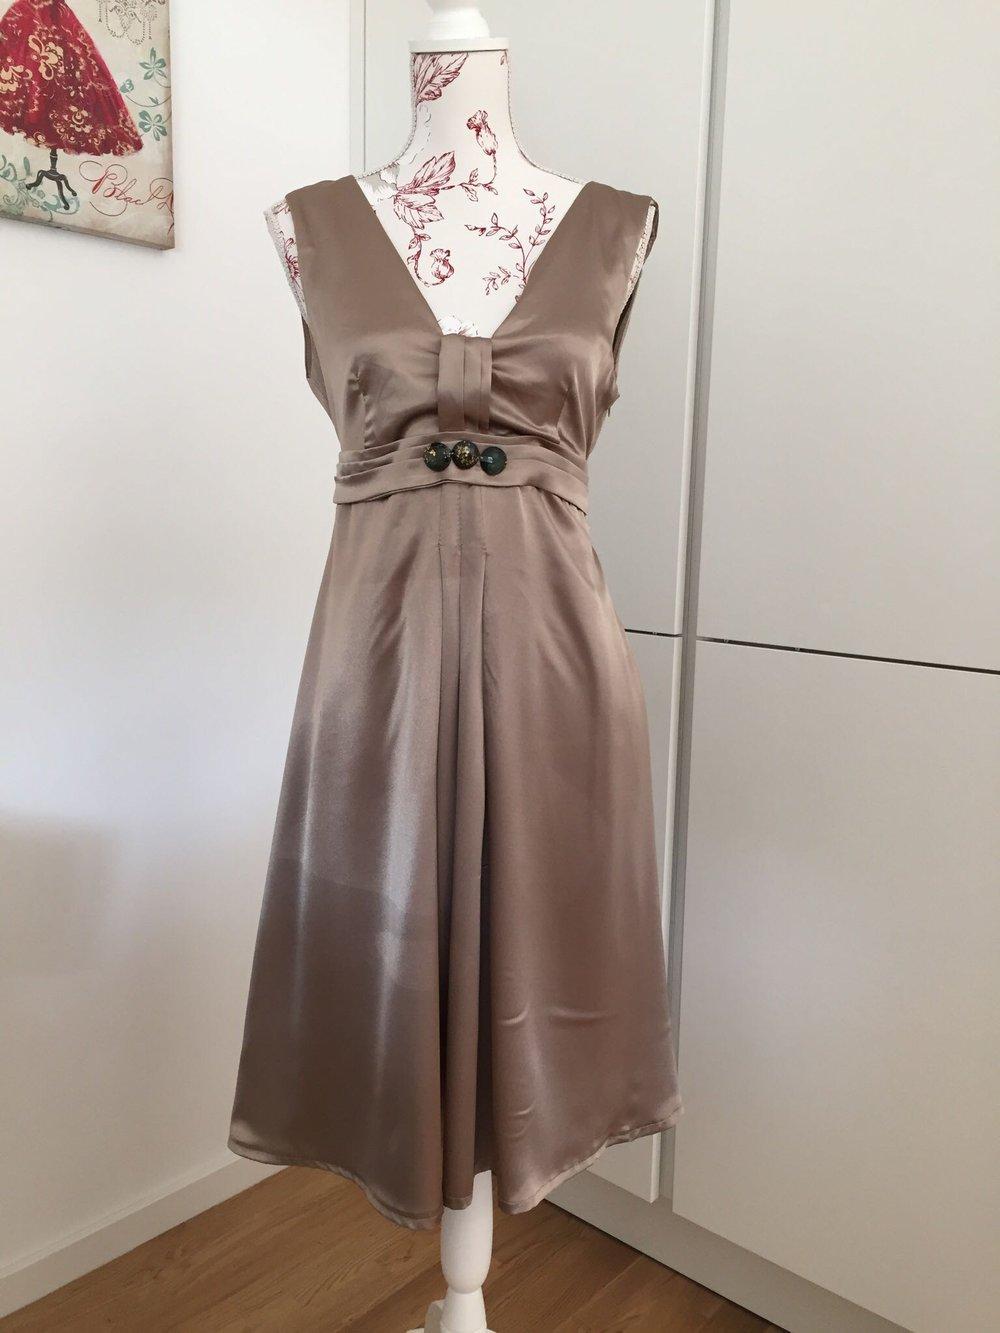 le group - Elegantes Kleid aus Italien bronzeton M :: Kleiderkorb.de